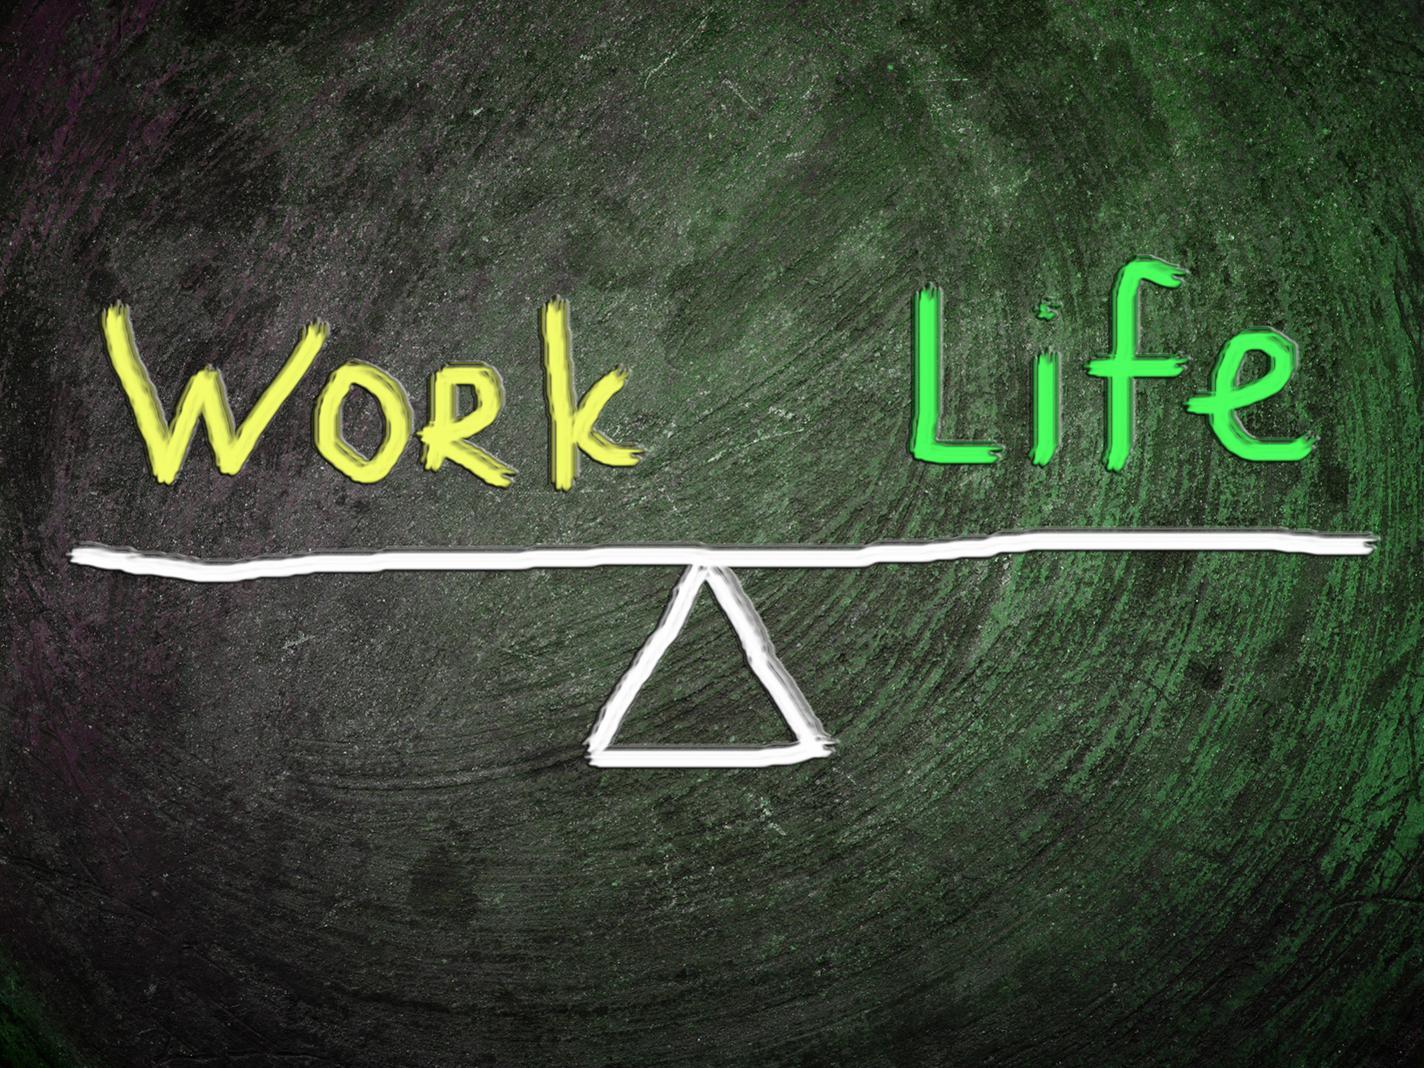 F:\2019\Work-Life-Balance_bigstock-69637519.jpg